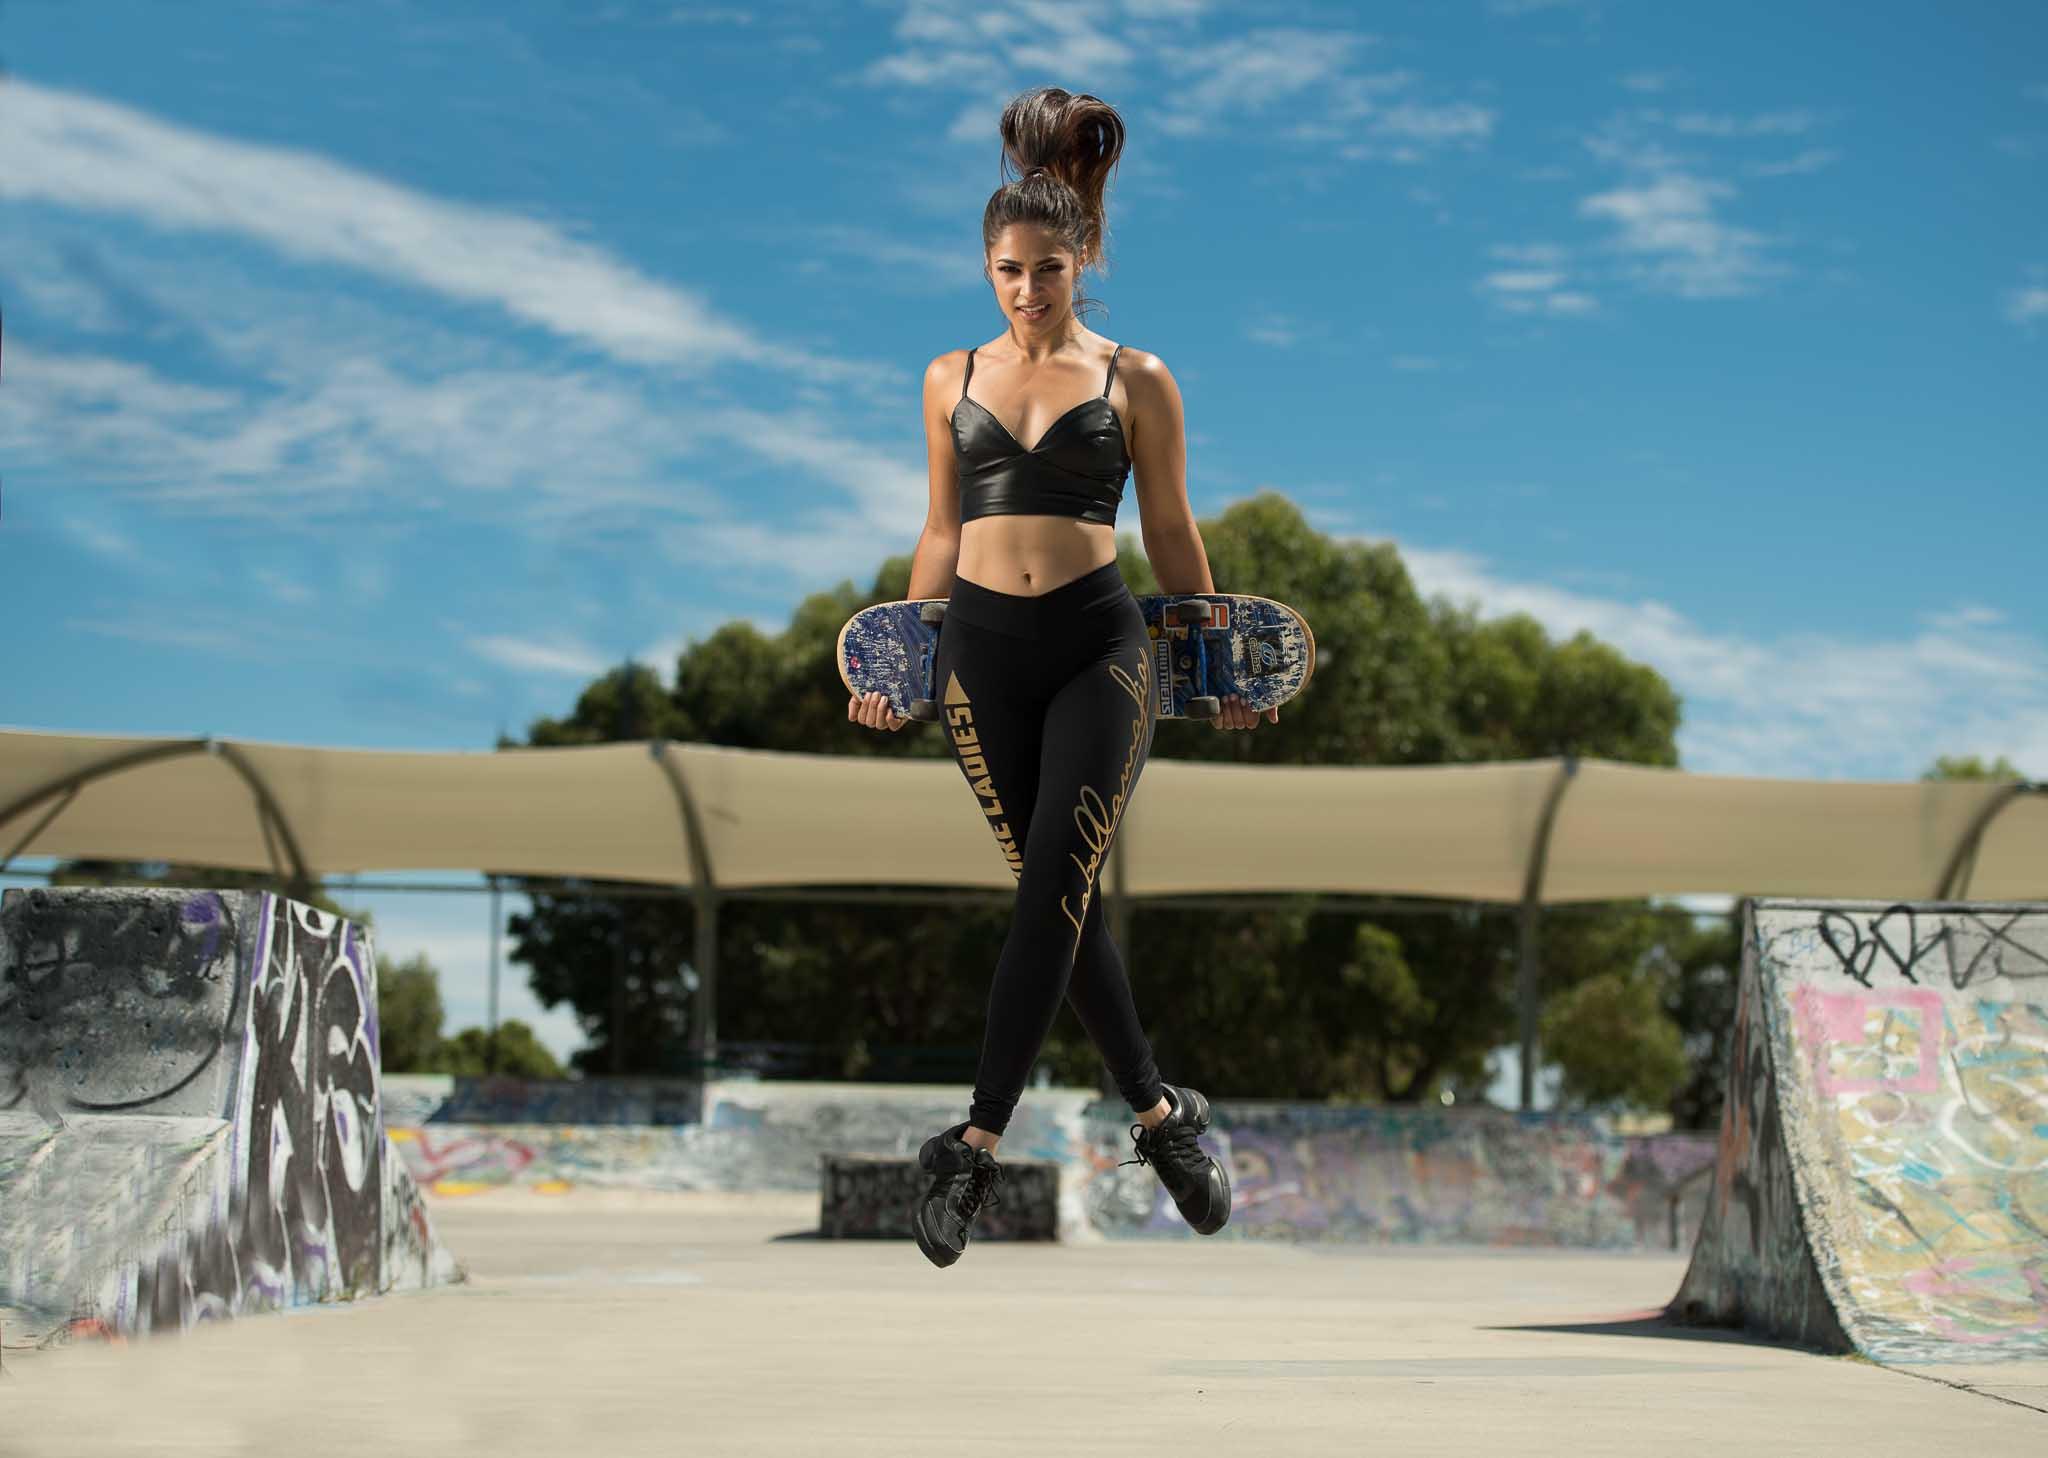 Karina jumping in skateboard park